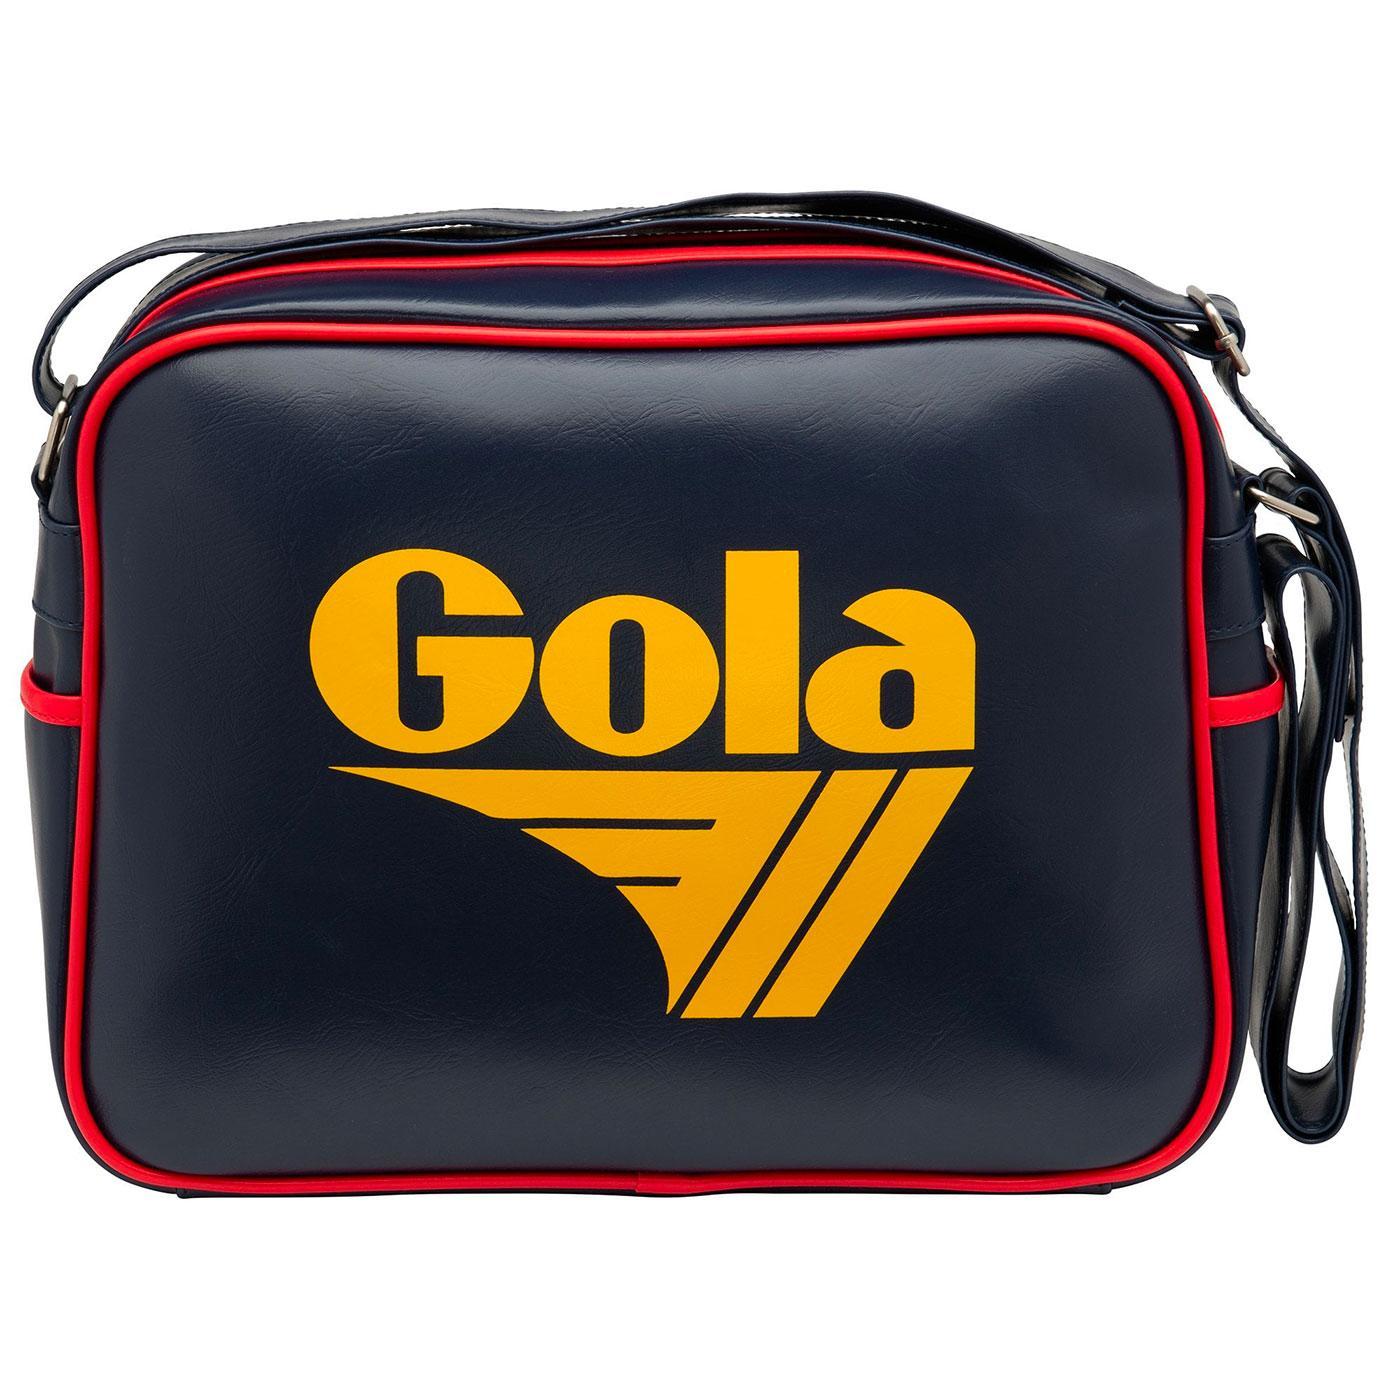 Redford GOLA Retro 70s Sports Shoulder Bag (N/S/R)